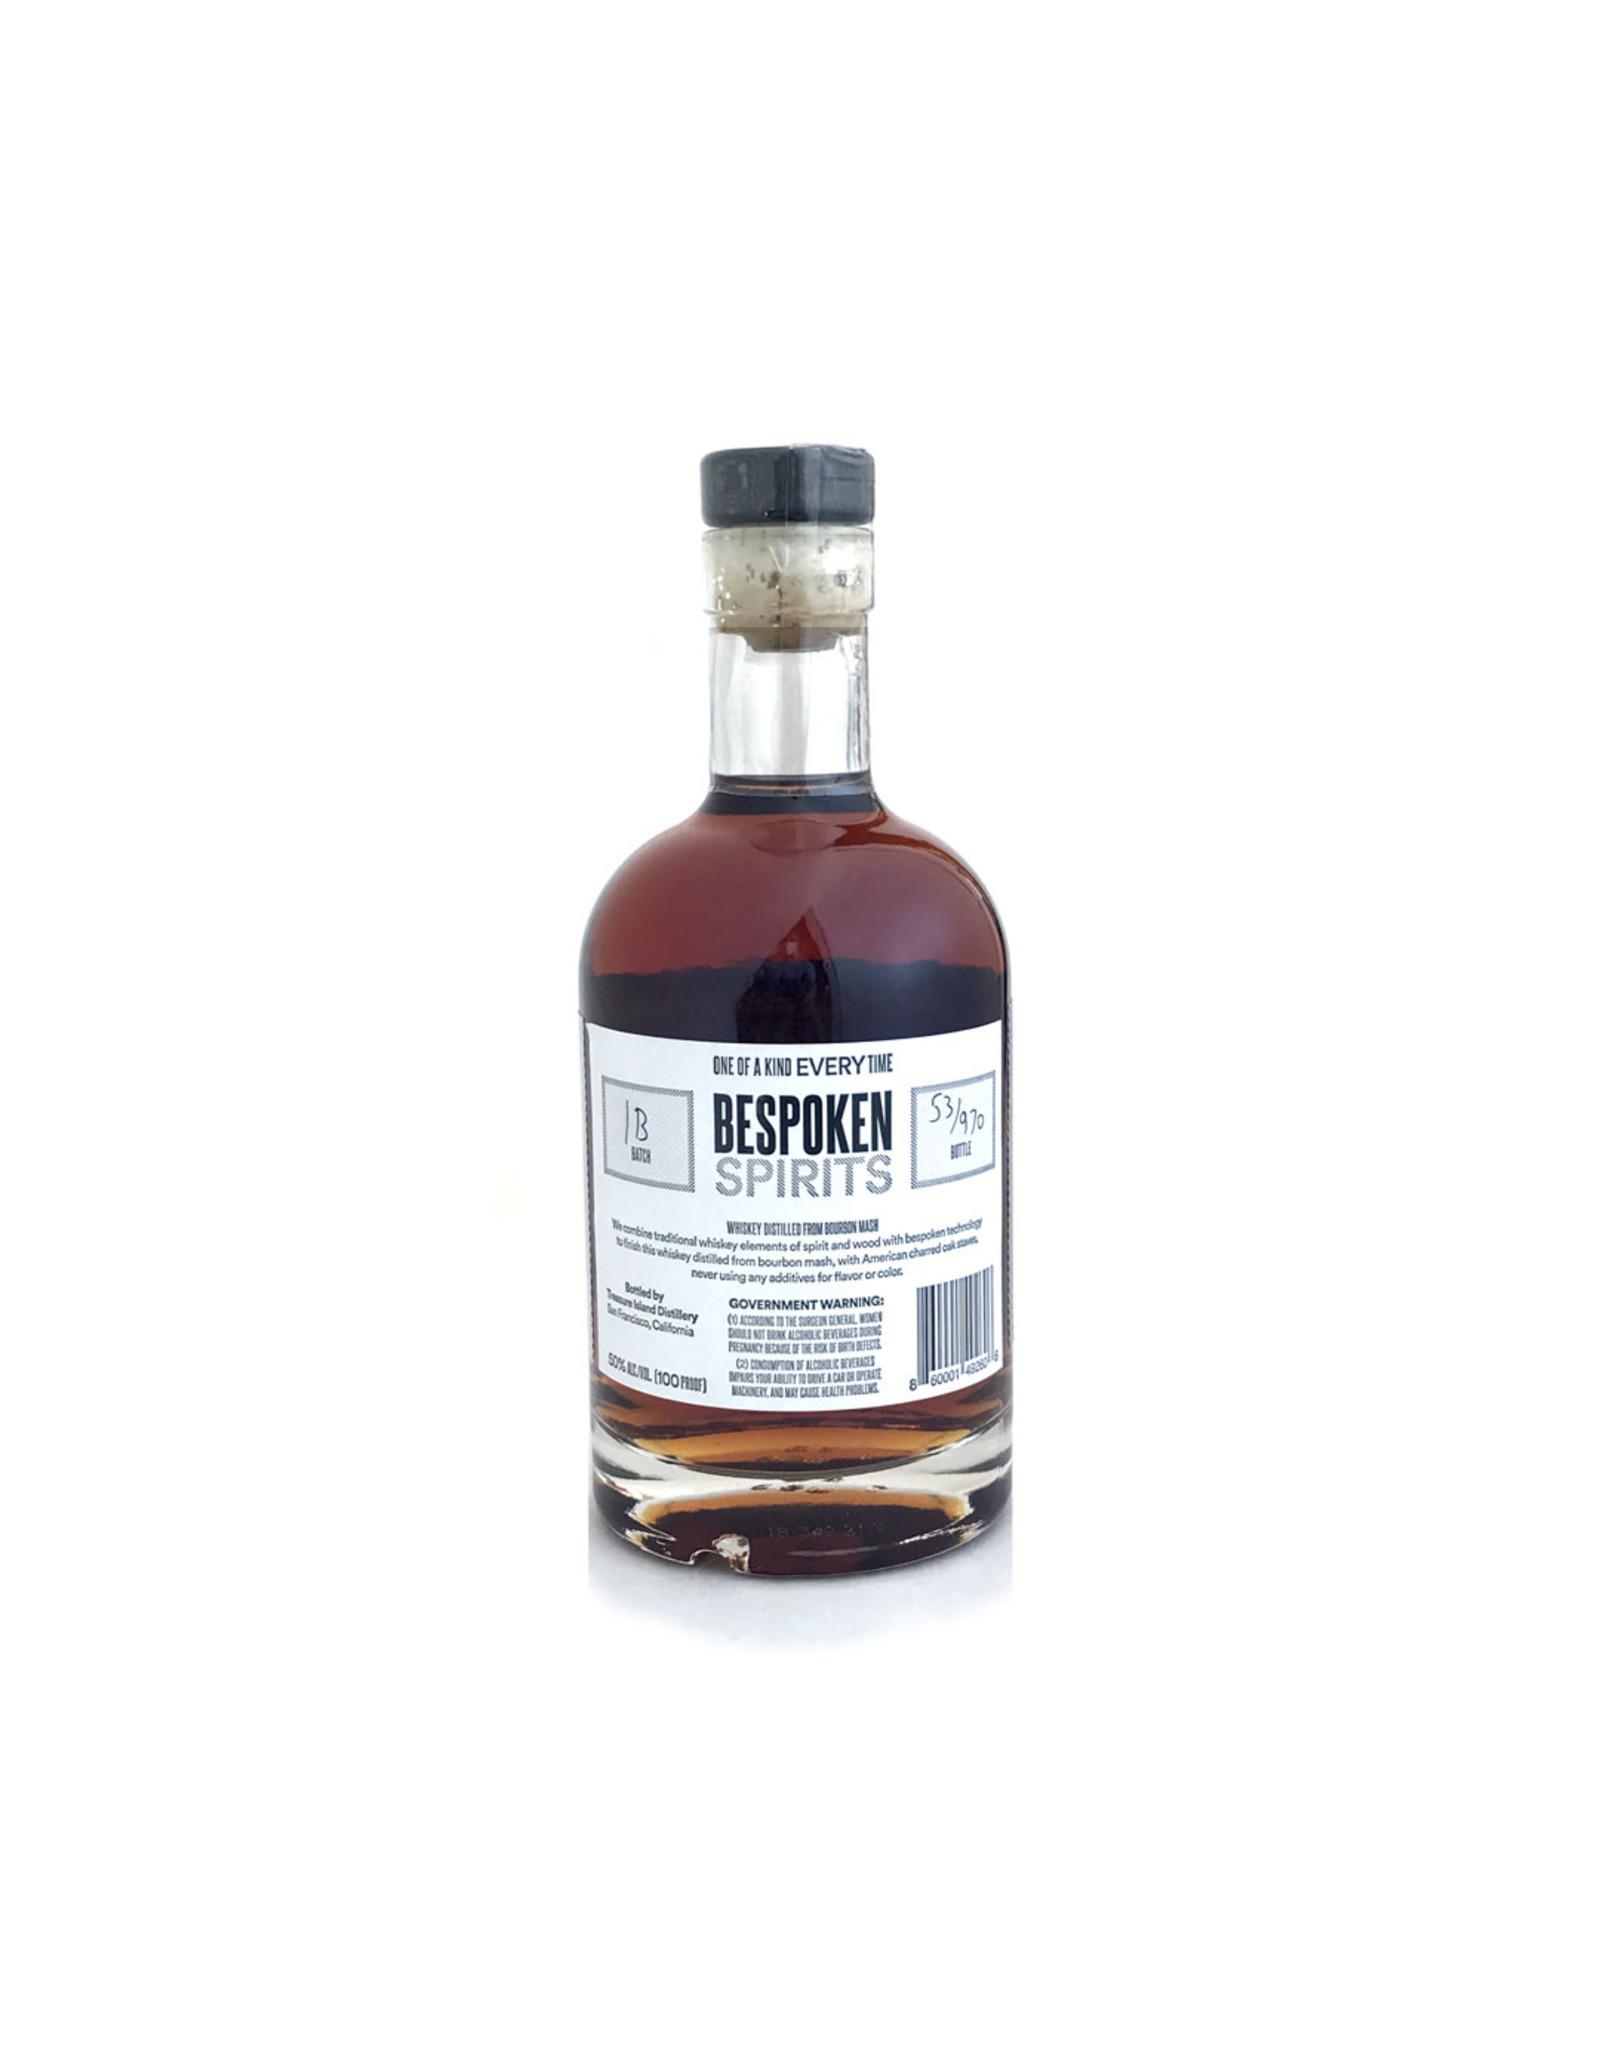 Bespoken Spirits Whiskey From Bourbon Mash Batch 01-B 375ml (Black Label)